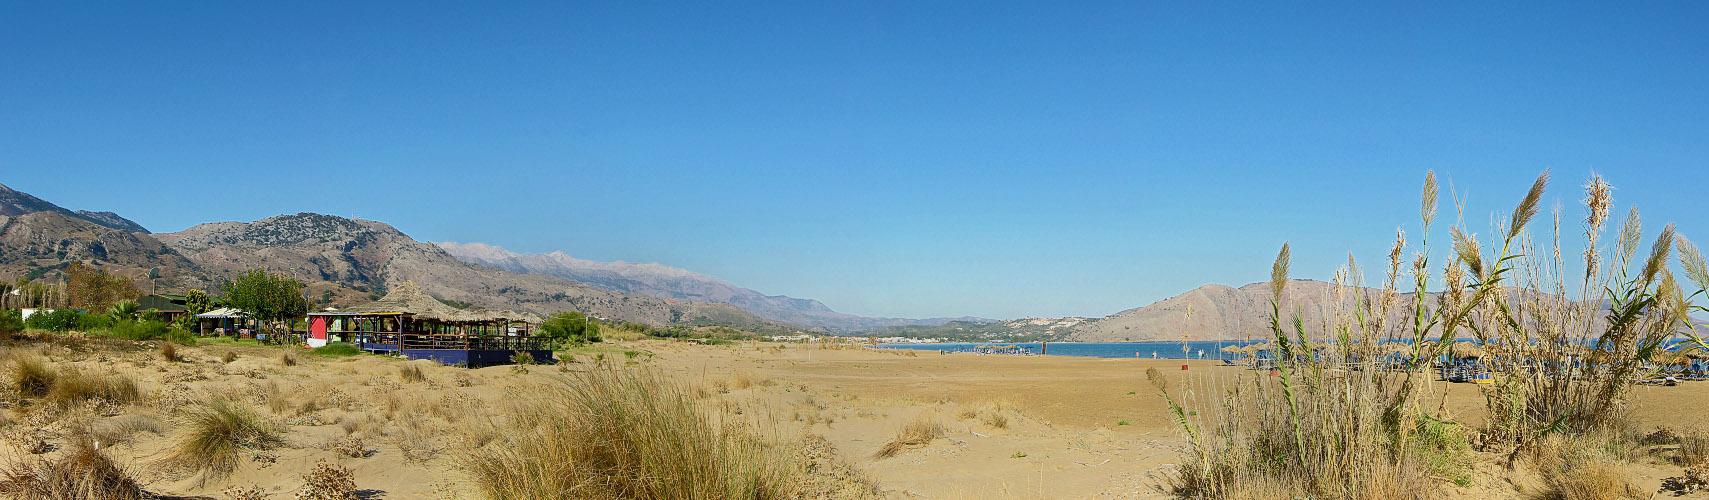 Kreta-2013_09_30-09_51_12 Panorama-klein